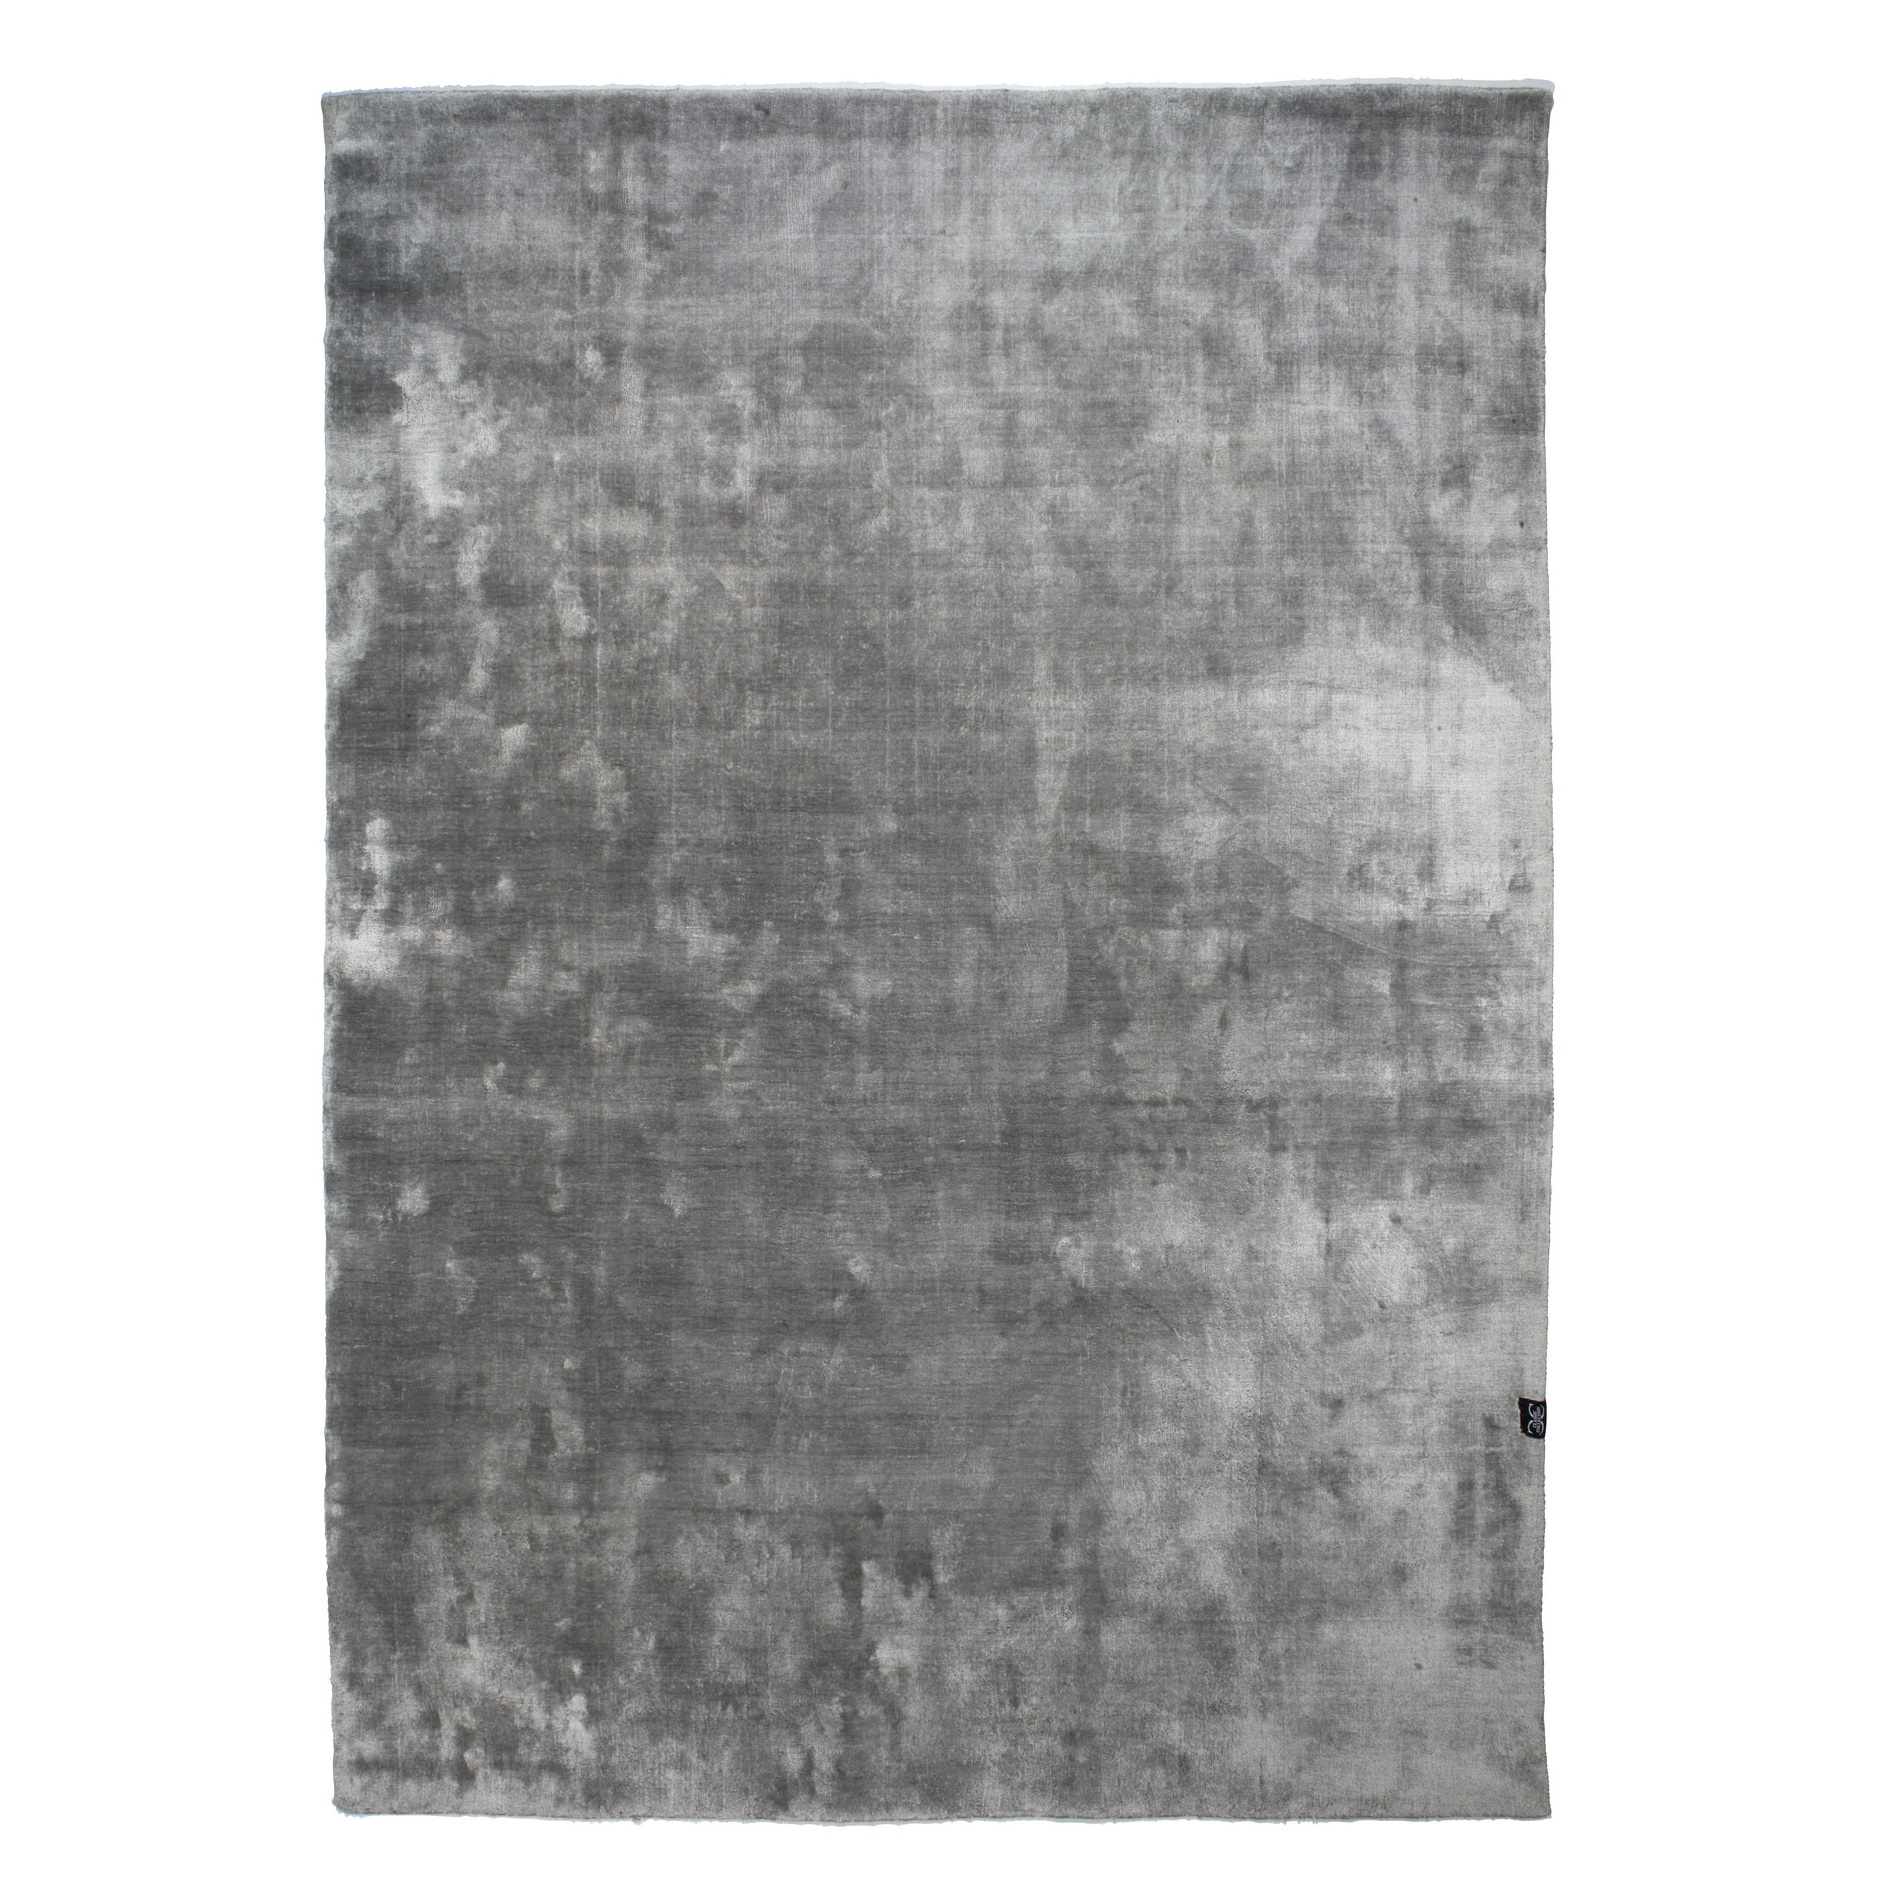 Viskosmatta VELVET TENCEL silver 250 x 350 cm, Classic Collection